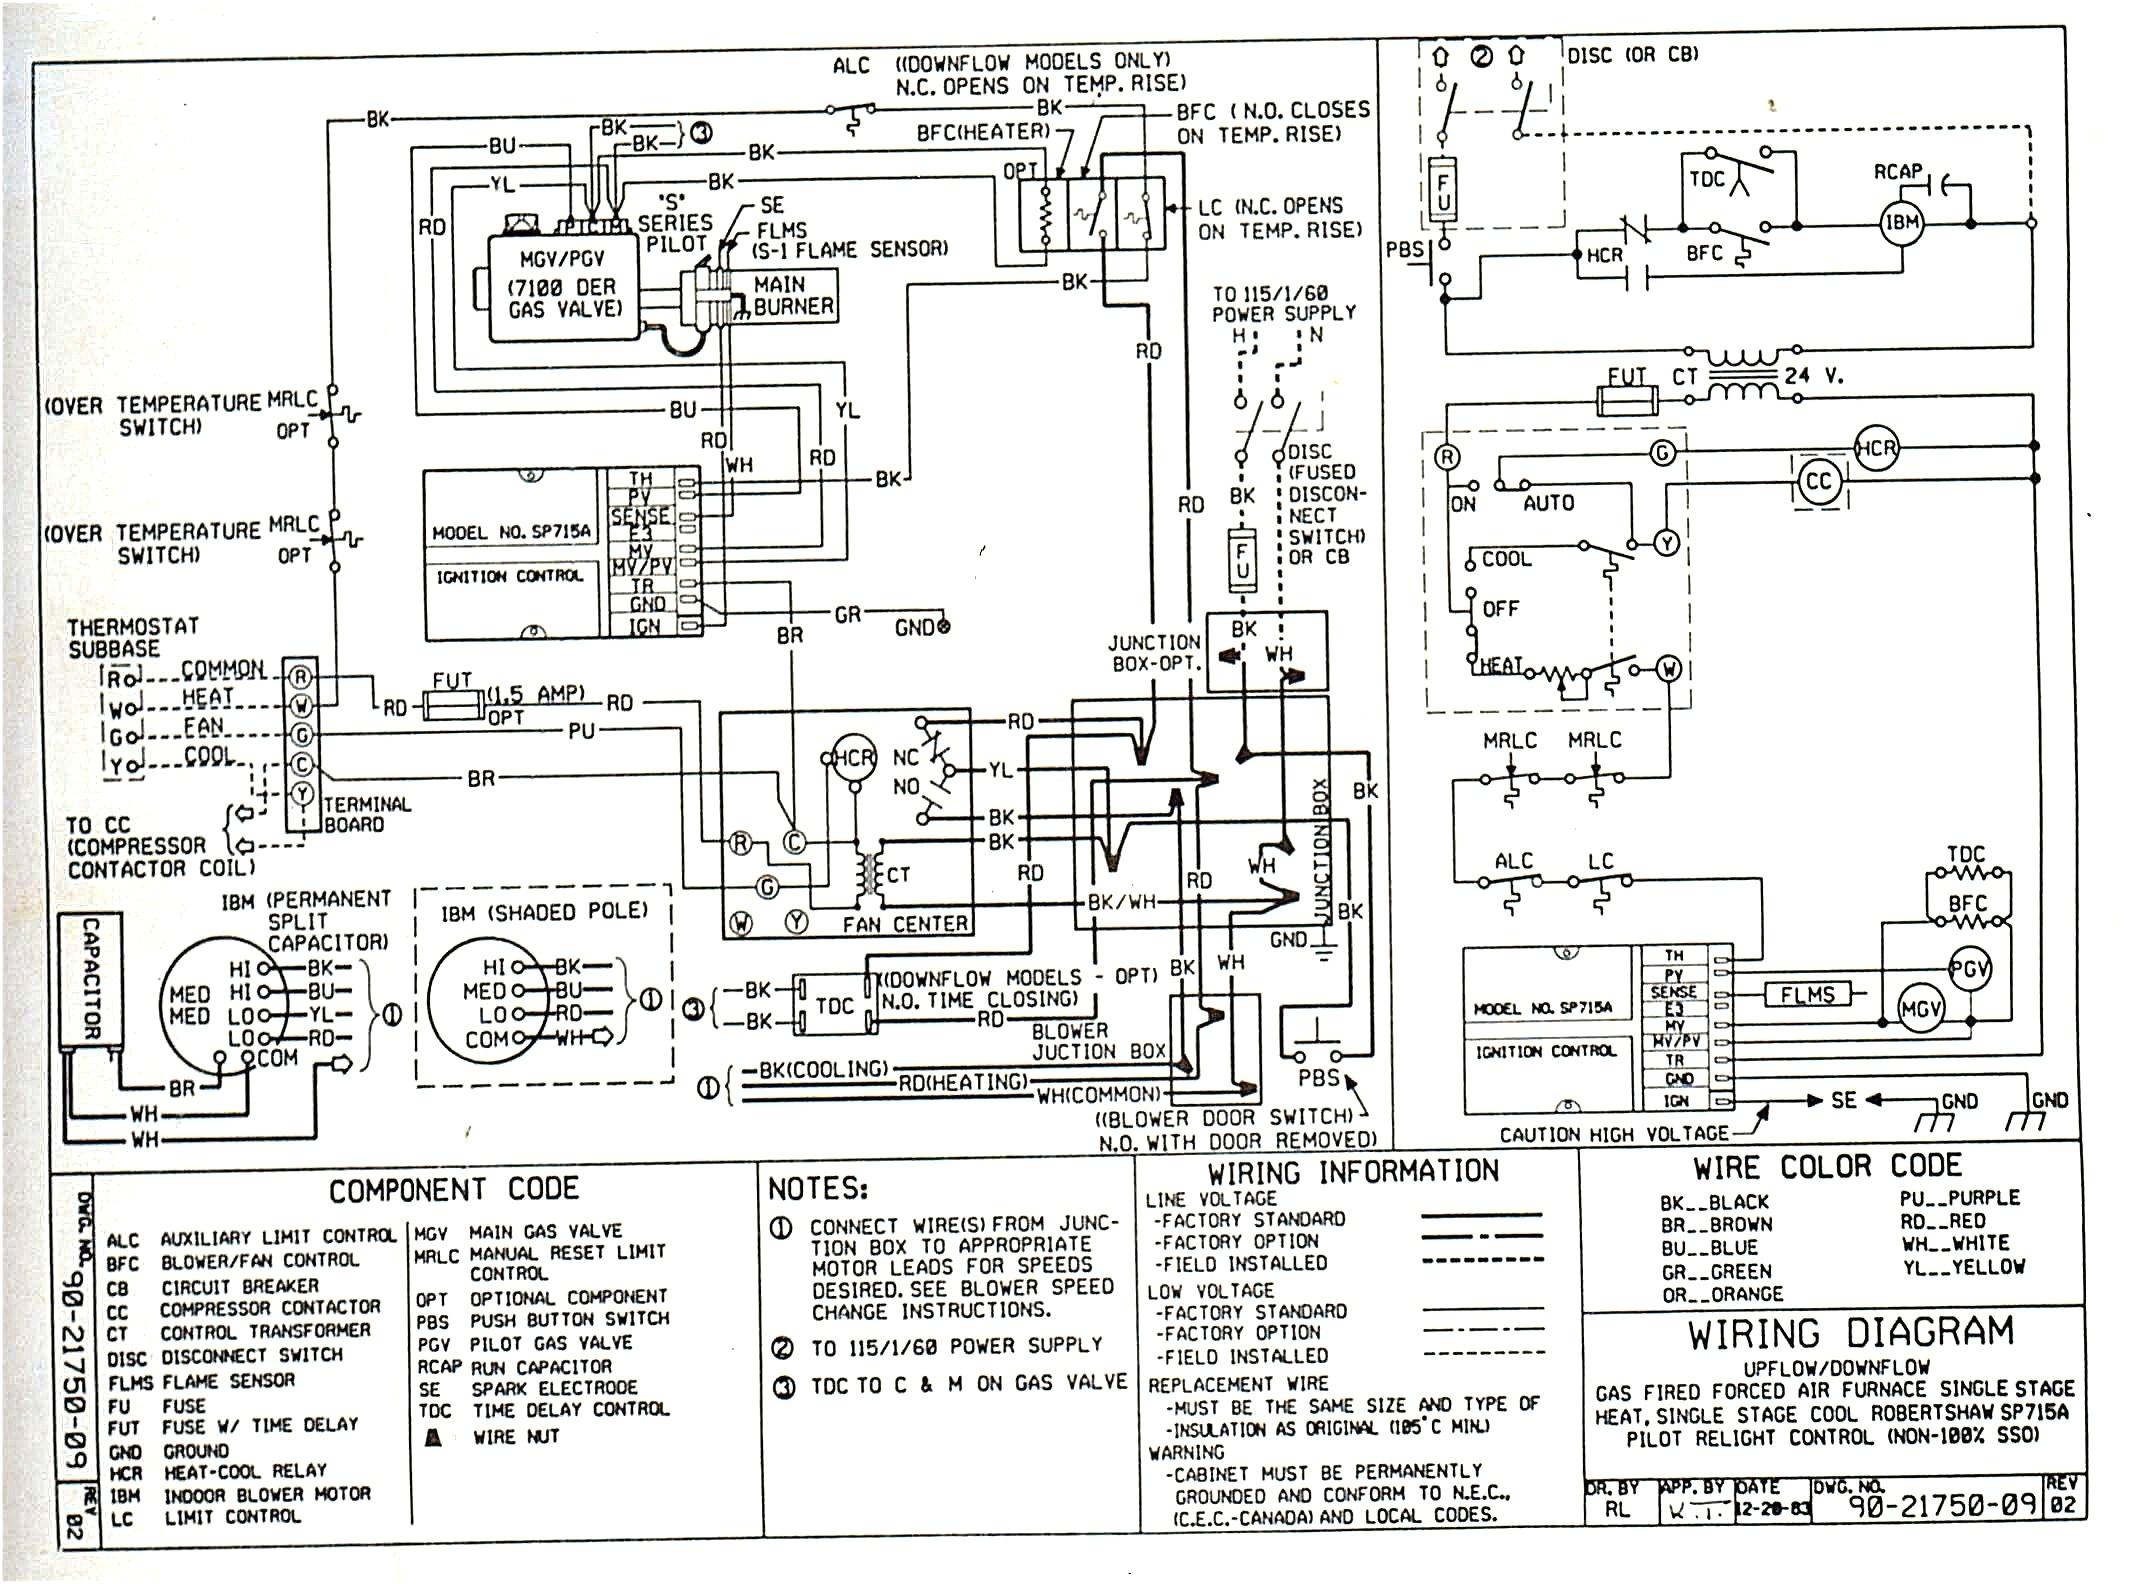 heil ac wiring diagram wiring diagram mega heil air handler wiring diagram